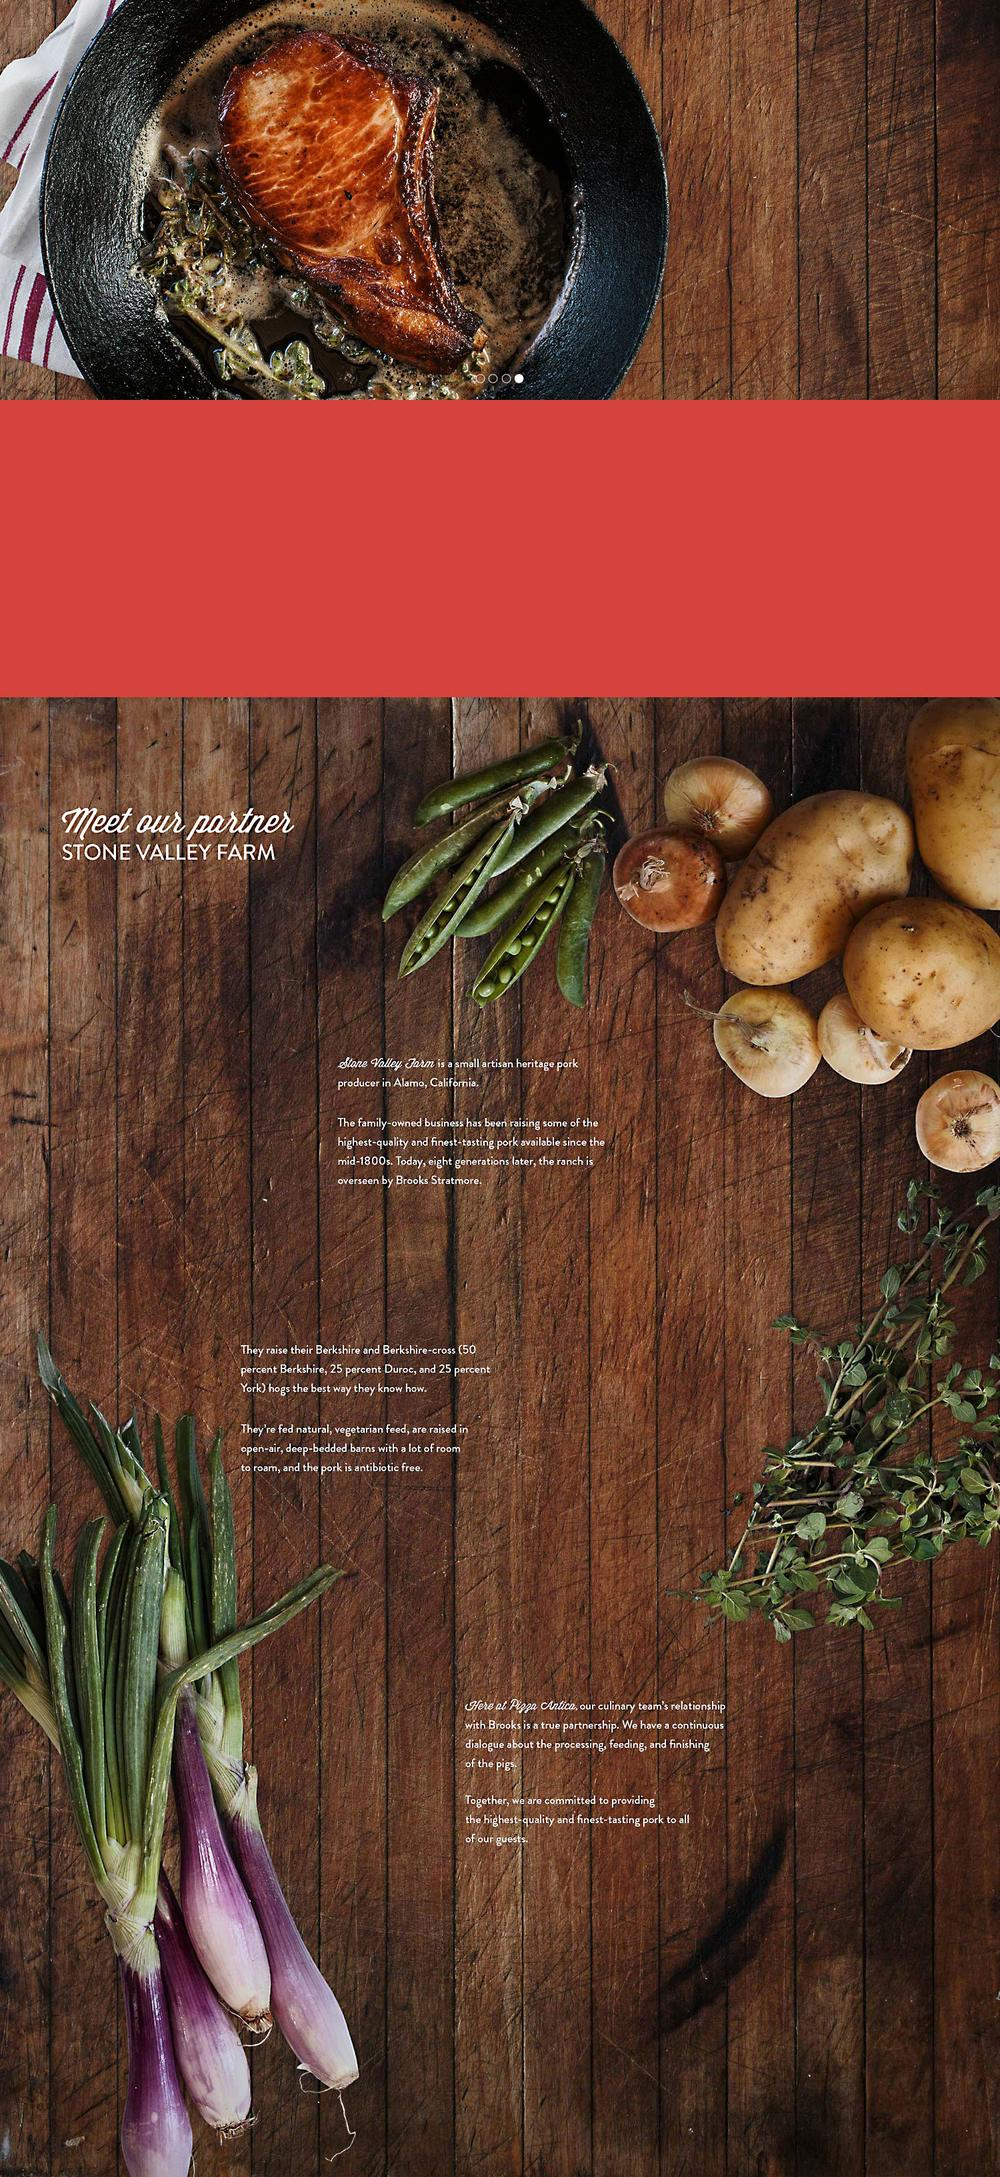 pork-chop-large-desktop-size.jpg